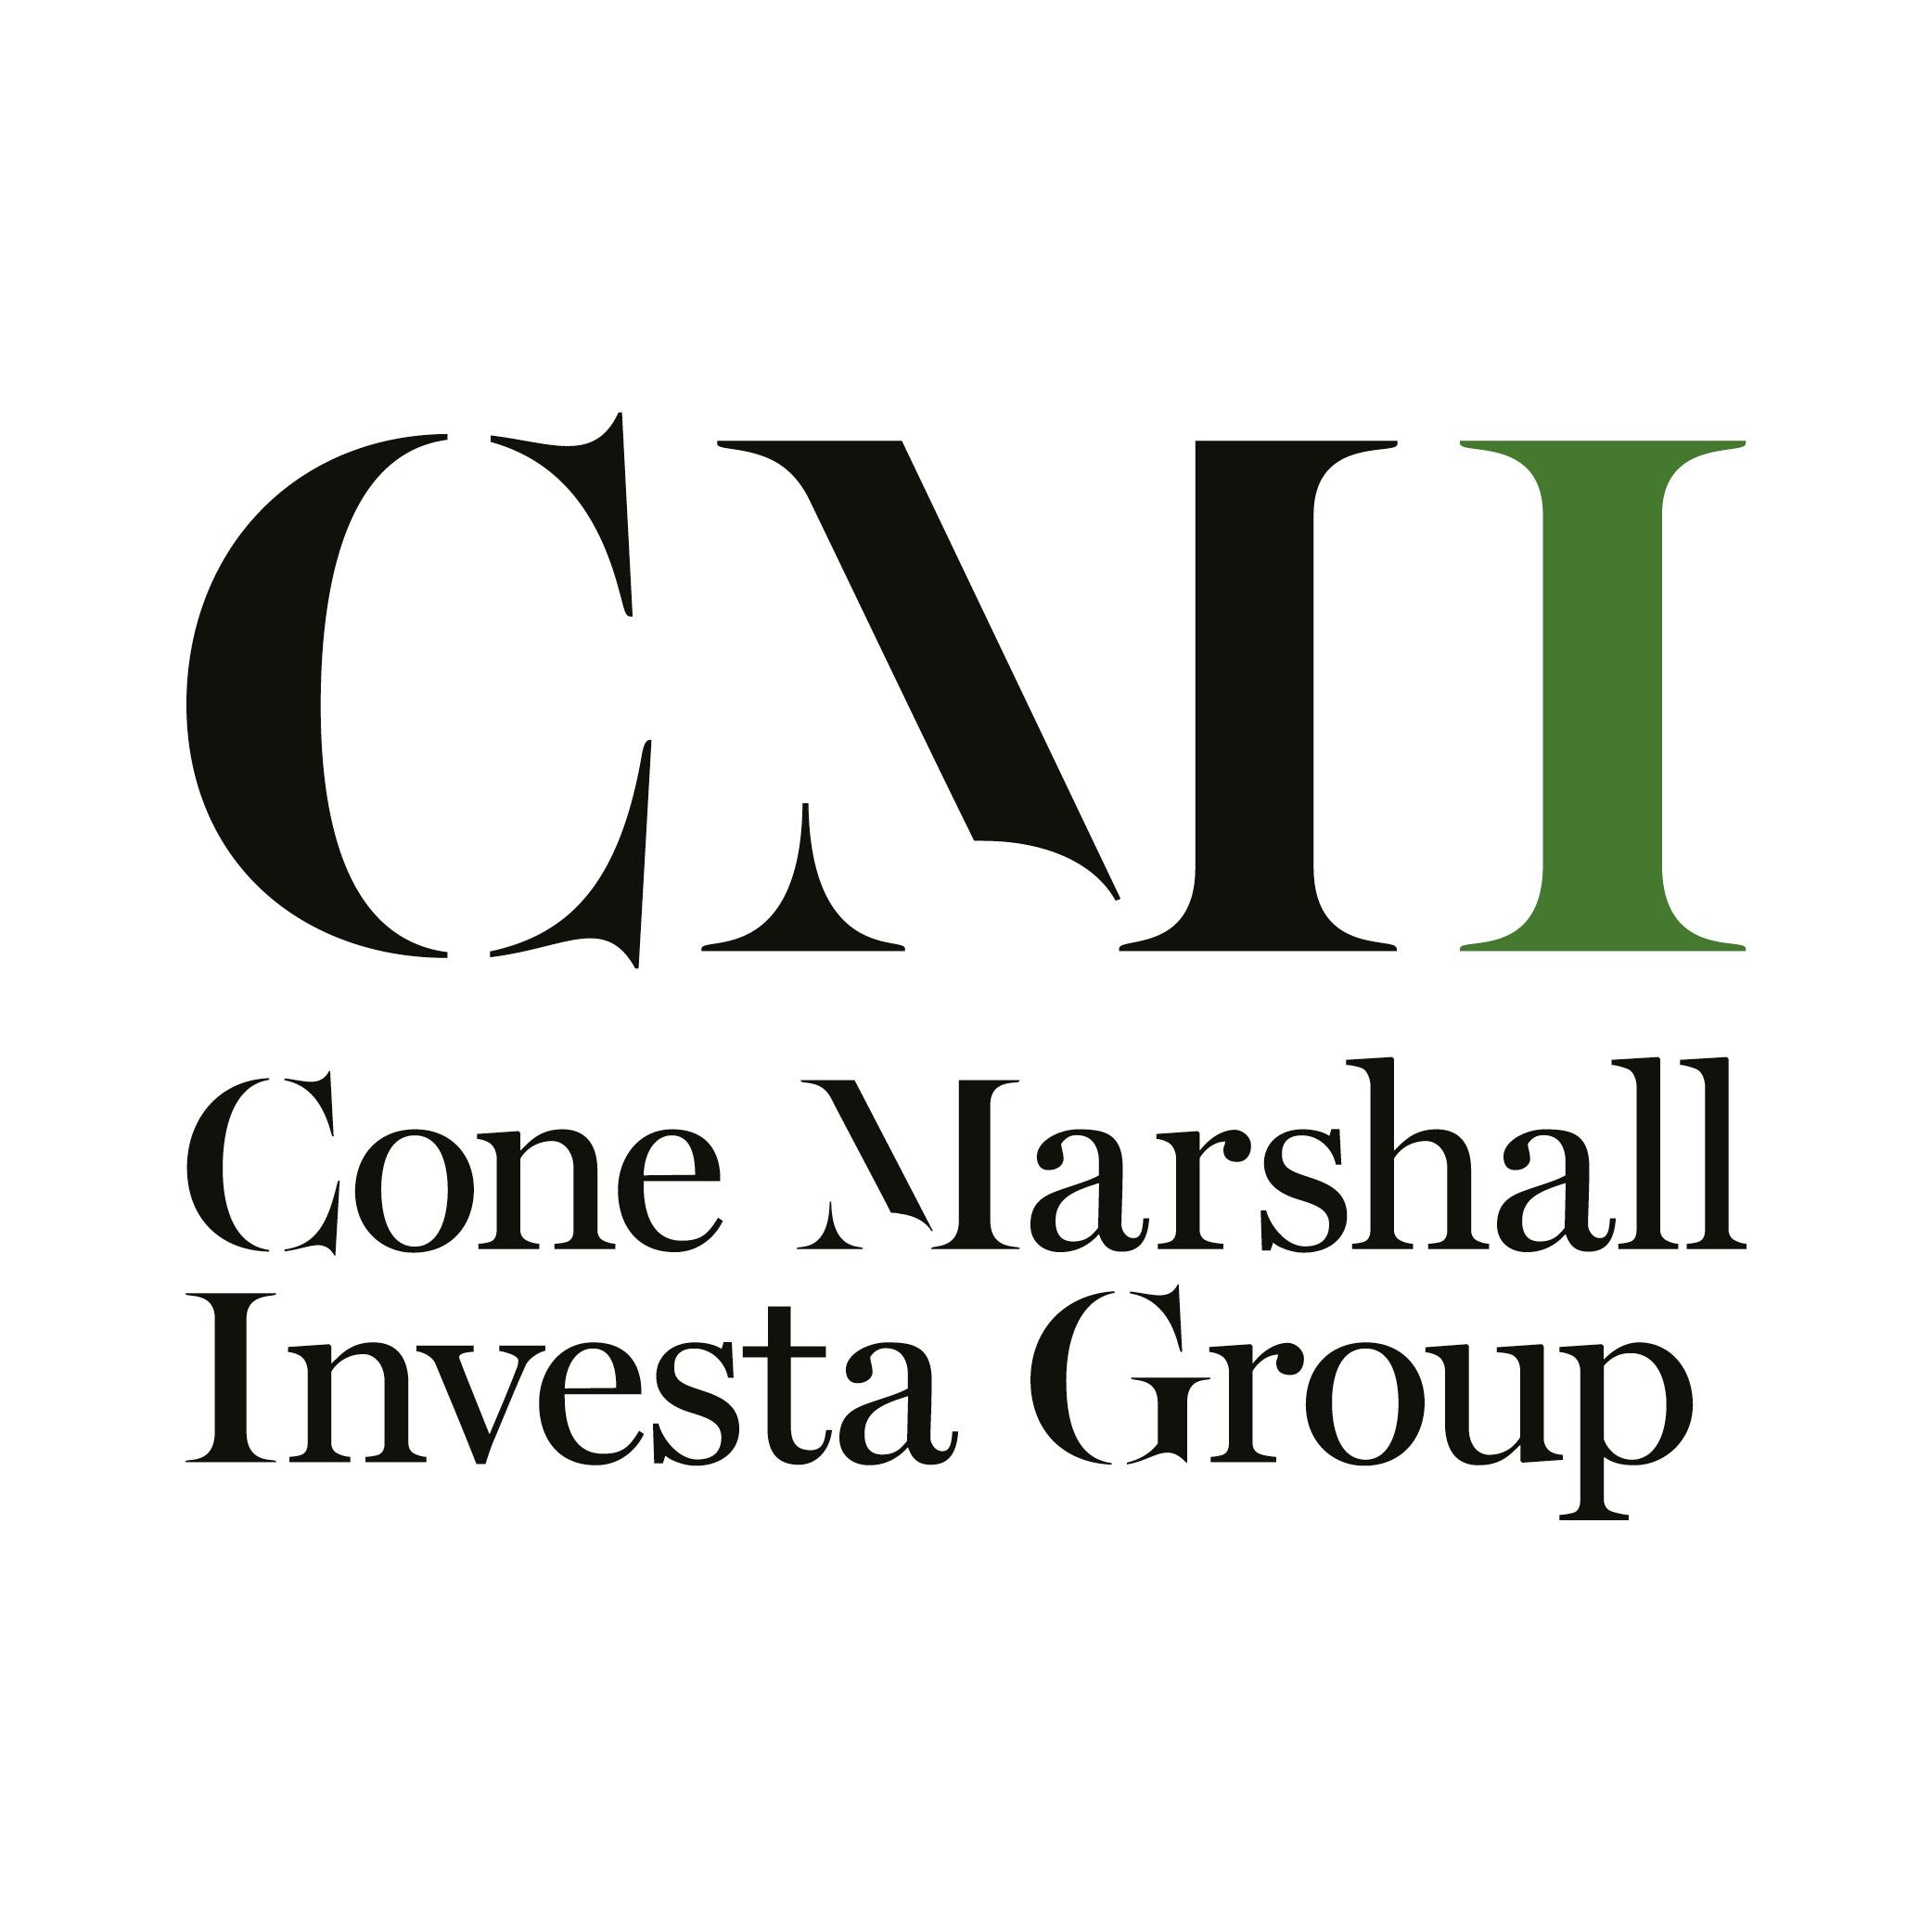 Cone Marshall Investa Group